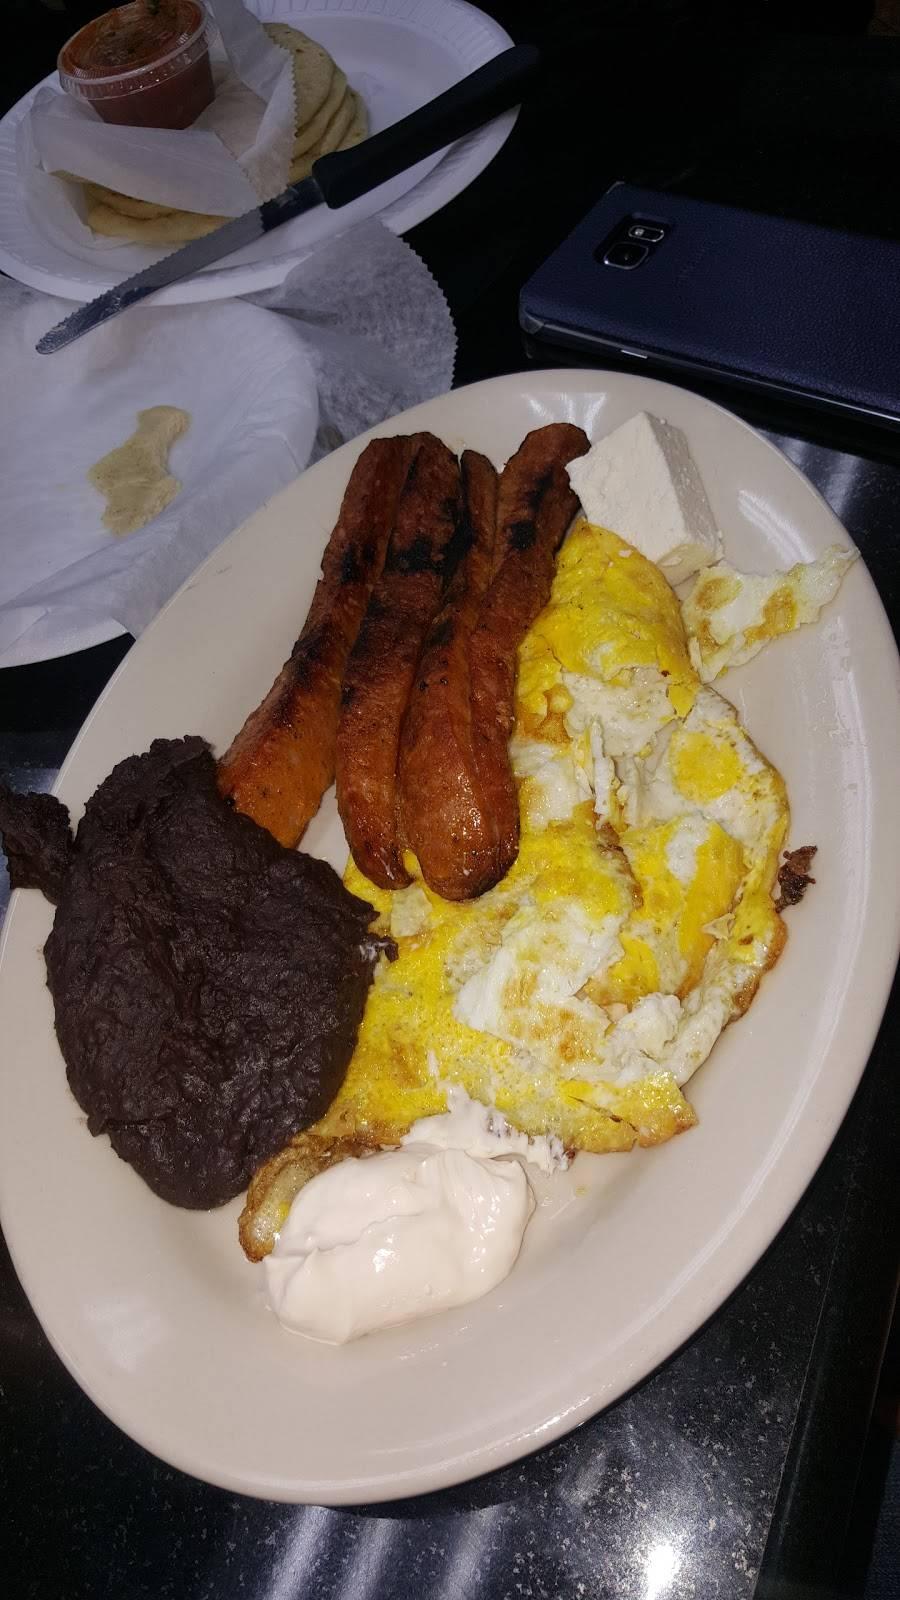 Medina Bakery | restaurant | 226 Anderson Ave # A, Fairview, NJ 07022, USA | 2019450099 OR +1 201-945-0099